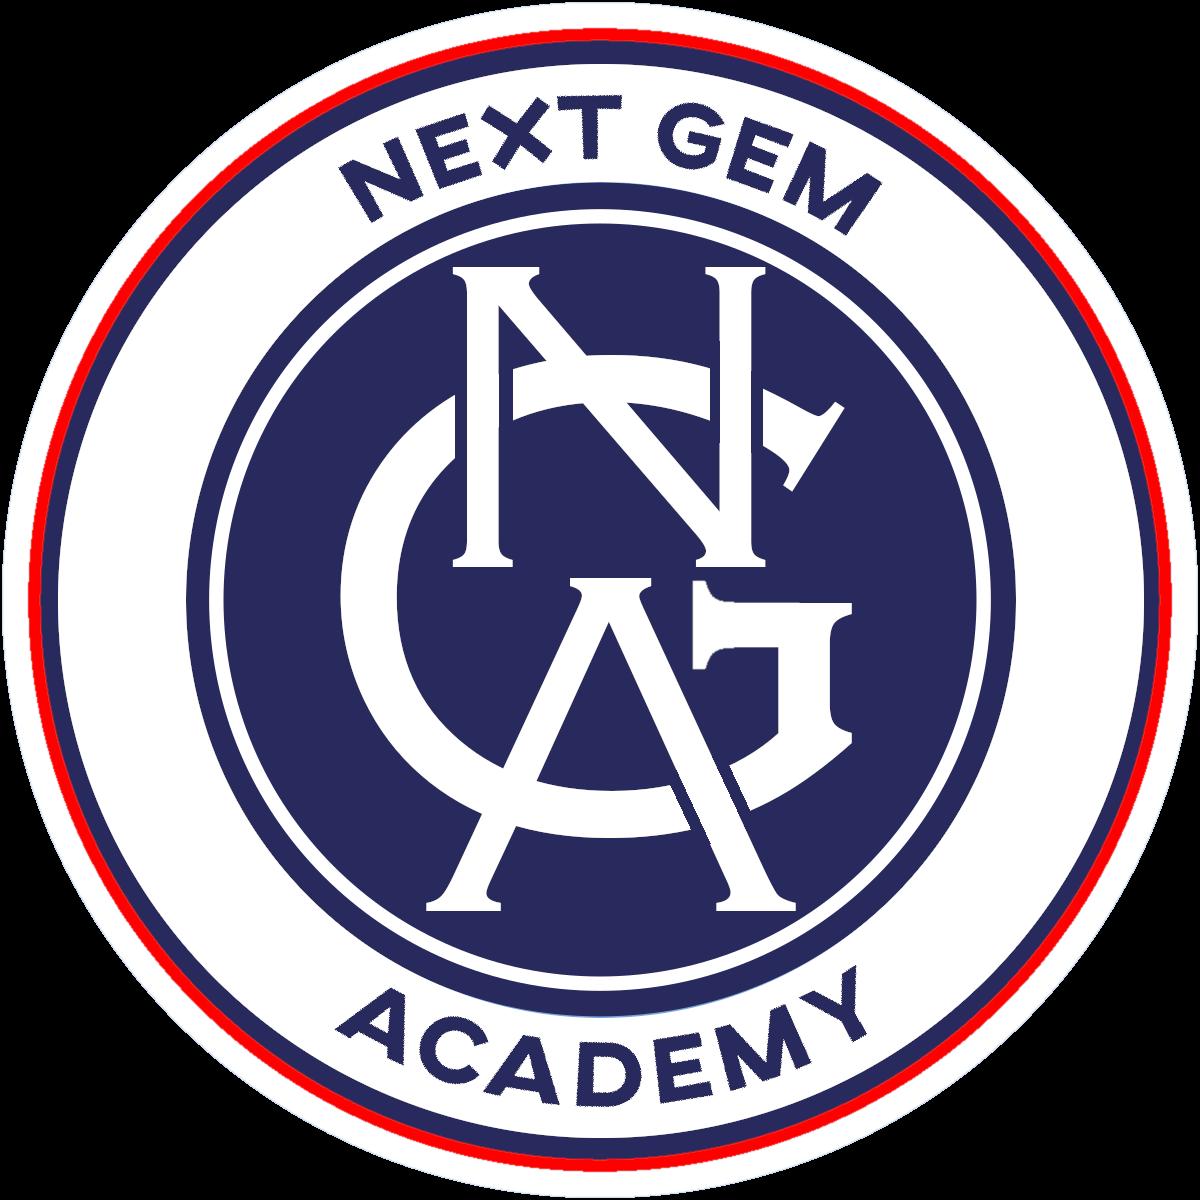 NextGemAcademy